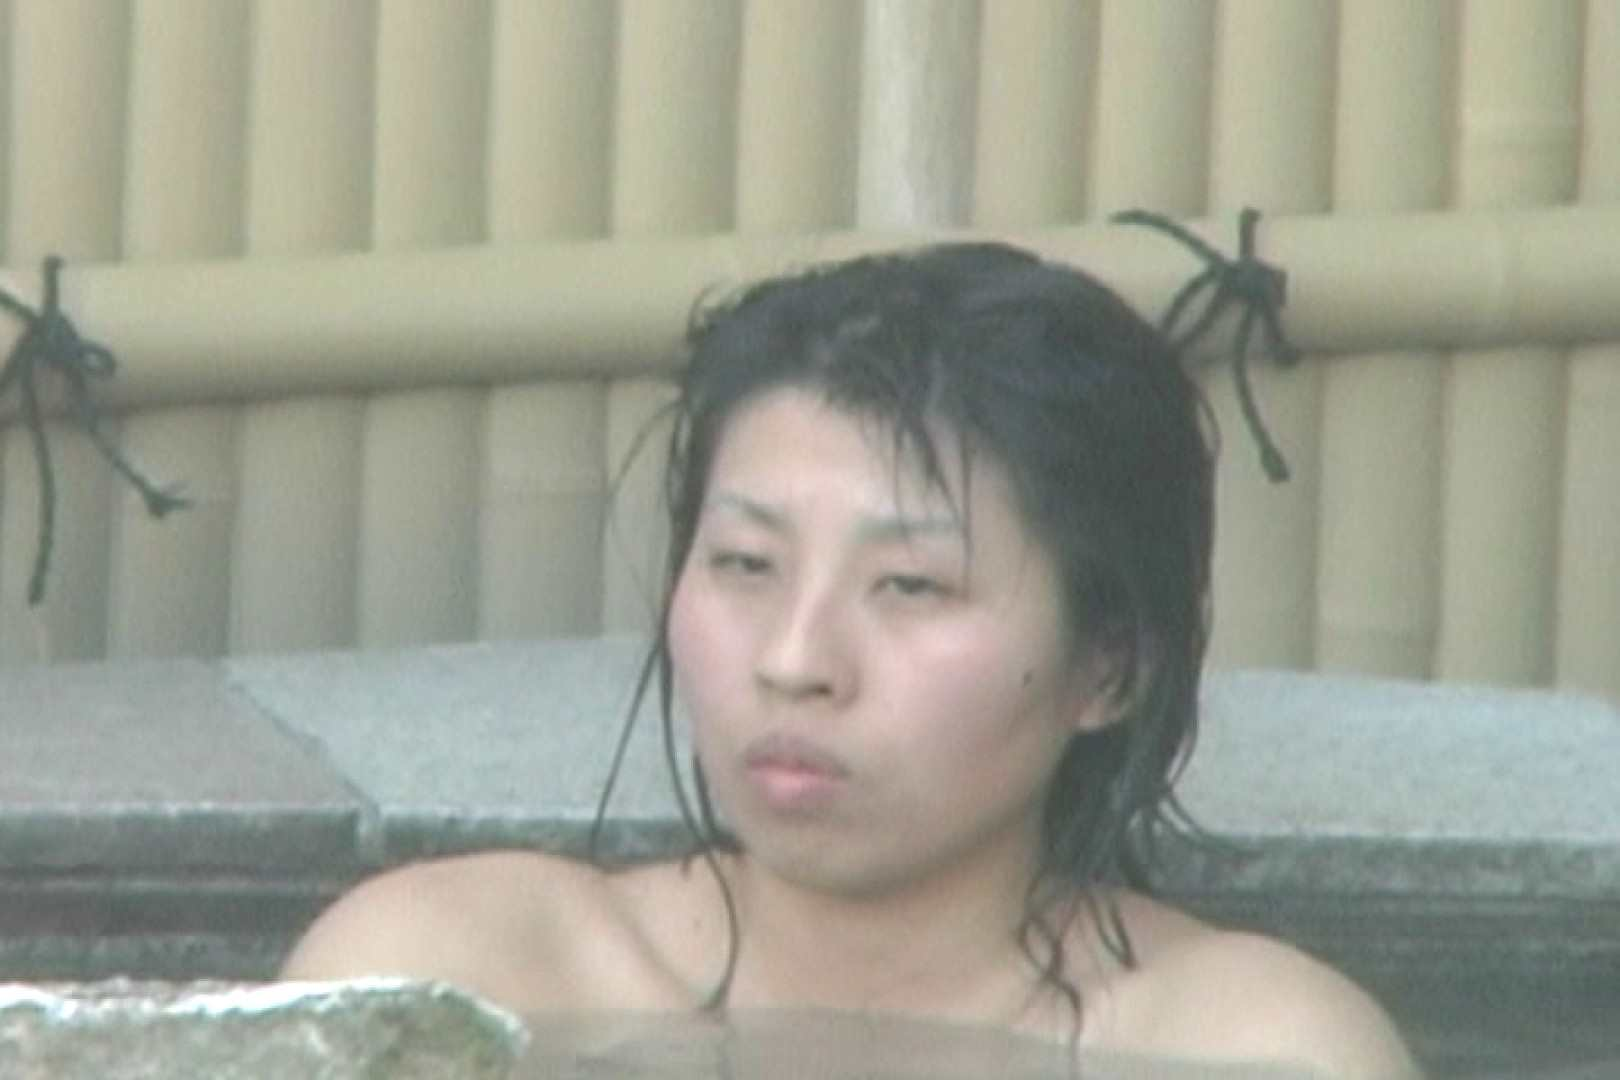 Aquaな露天風呂Vol.589 盗撮 | HなOL  105pic 42